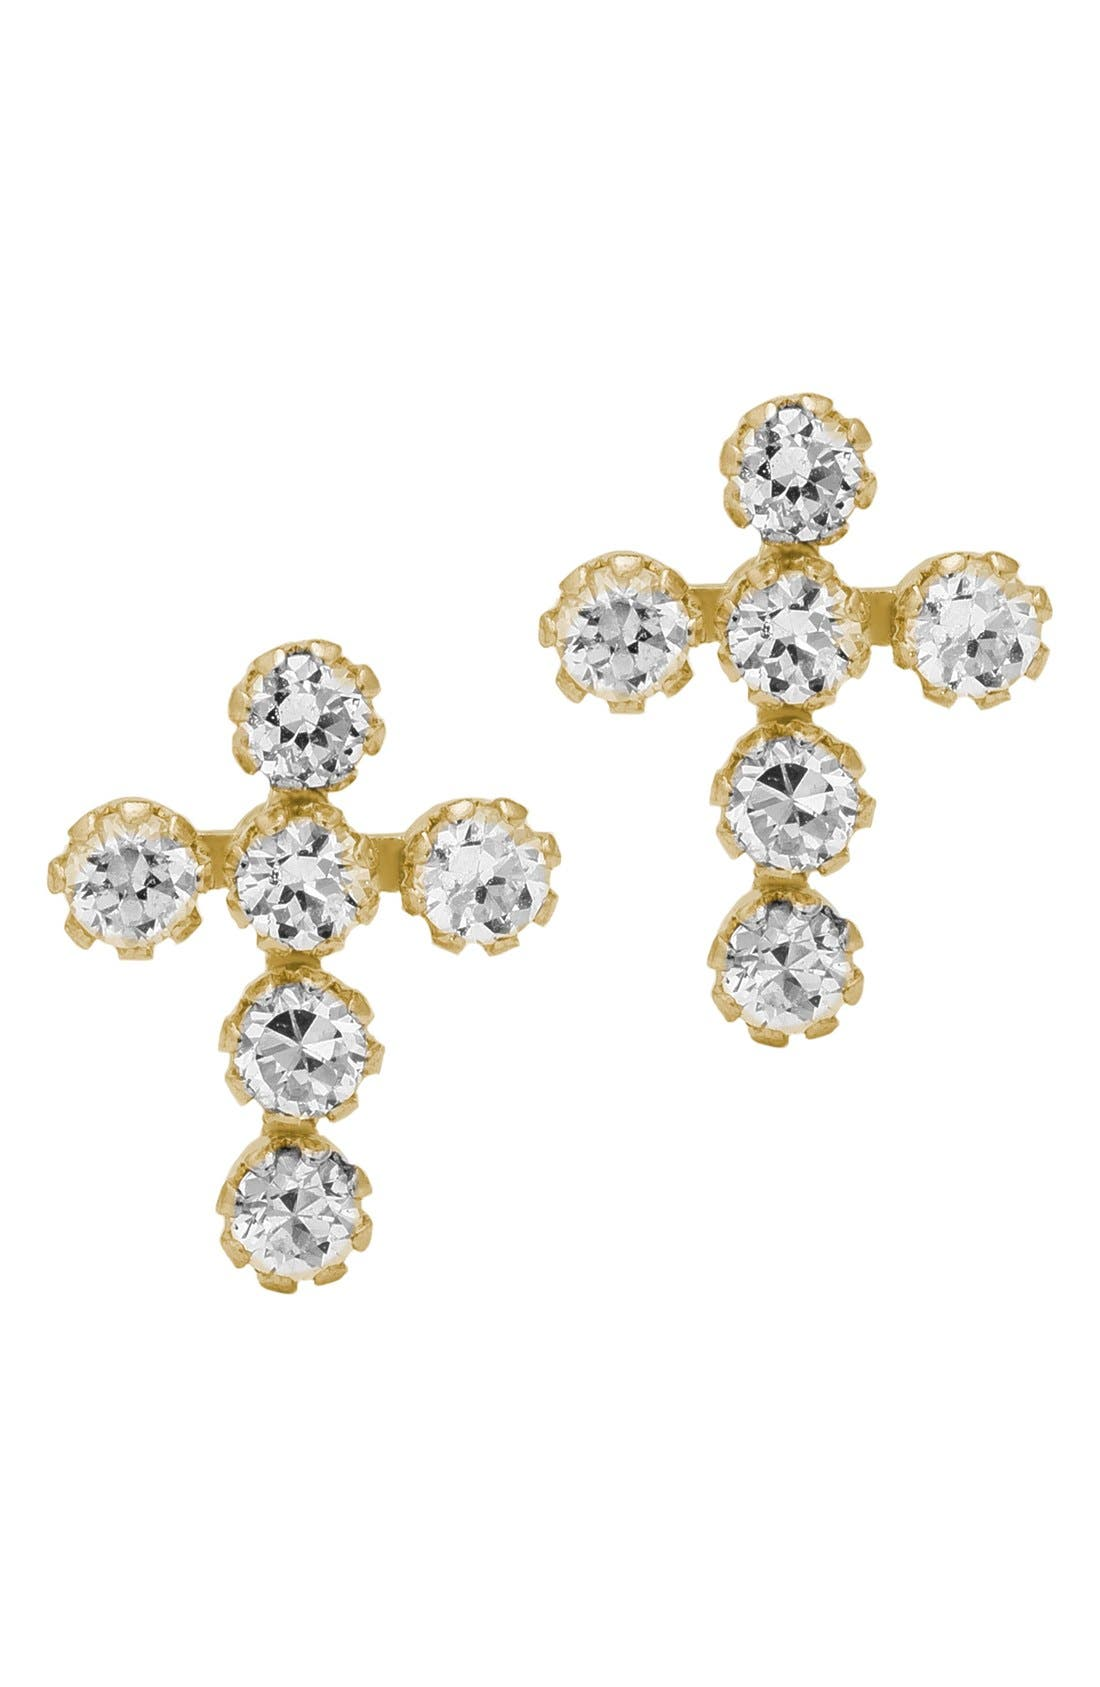 14k Gold & Cubic Zirconia Cross Earrings,                         Main,                         color, GOLD